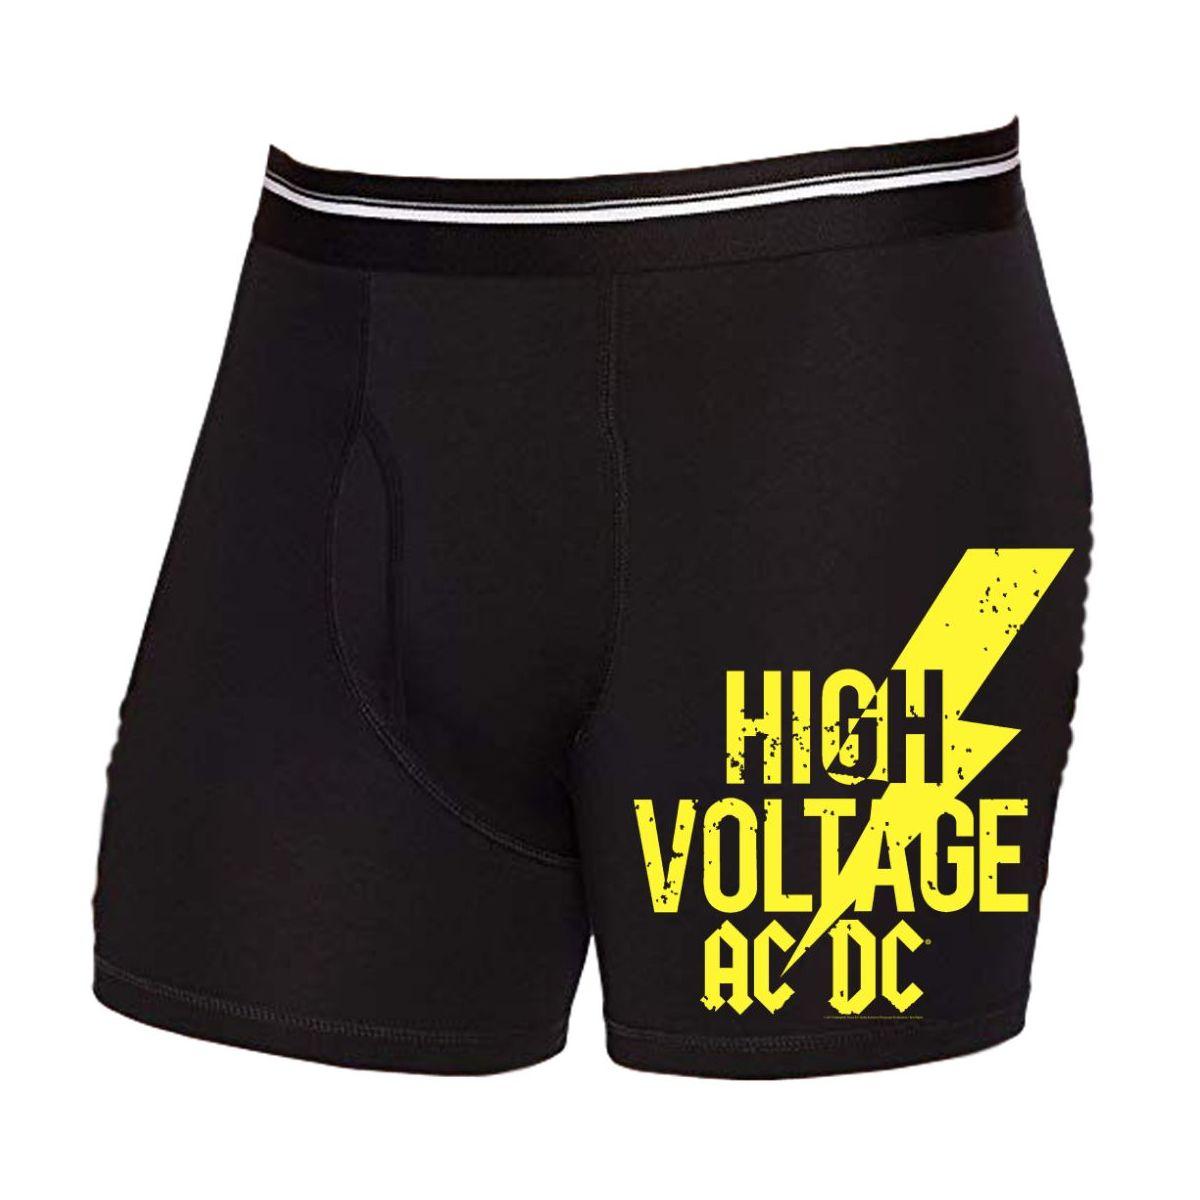 AC/DC Voltage Boxer Briefs